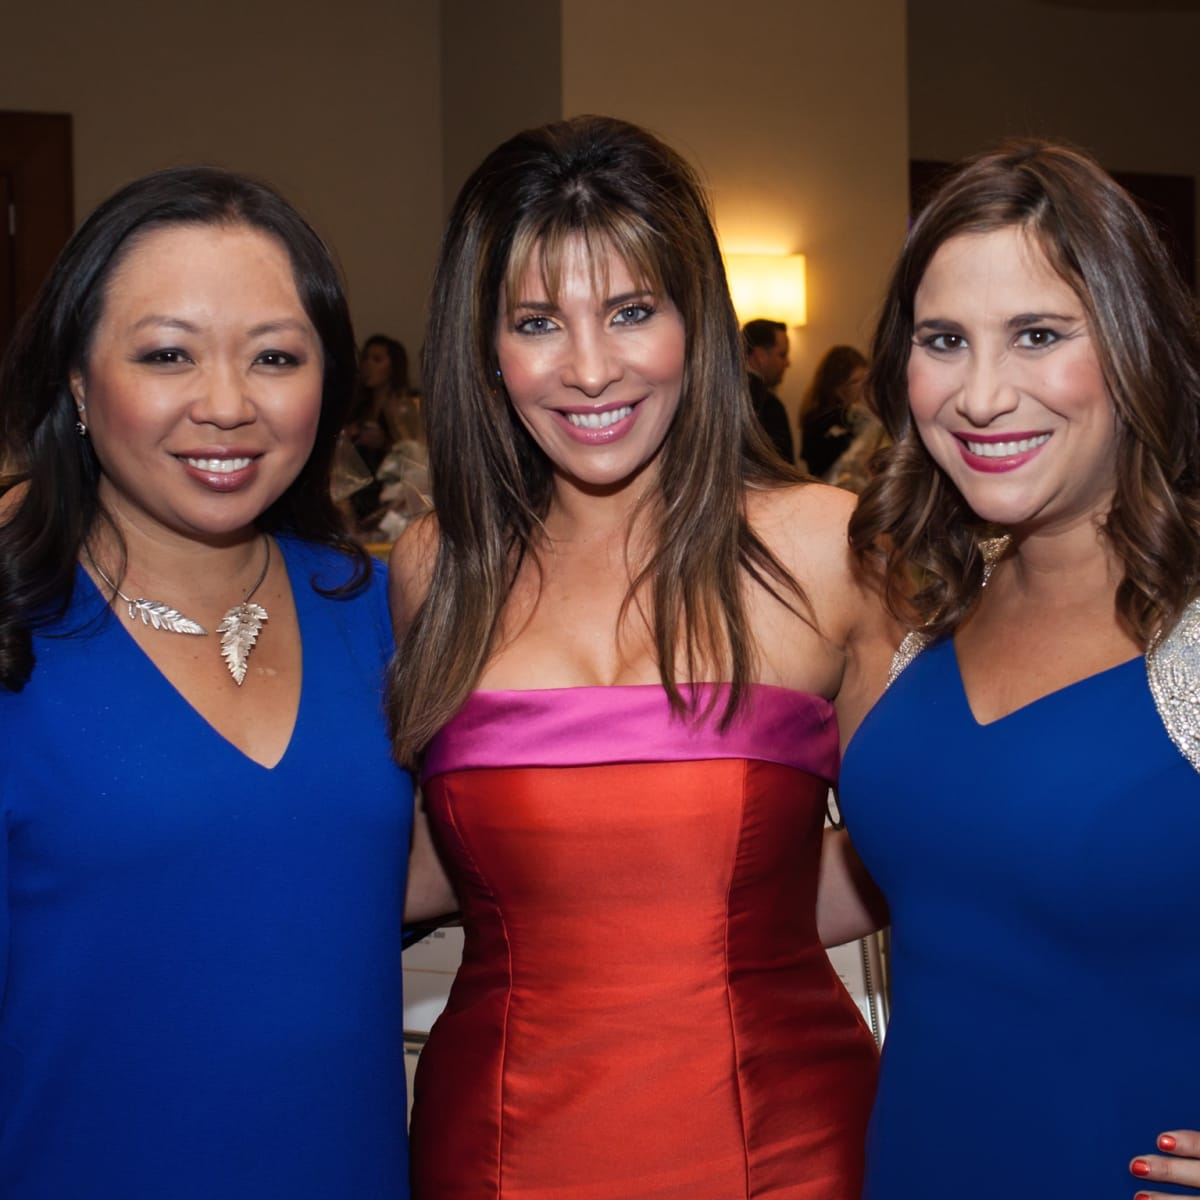 Miya Shay, Claudia Sierra, Jacqueline Smook at Elijah Rising Gala